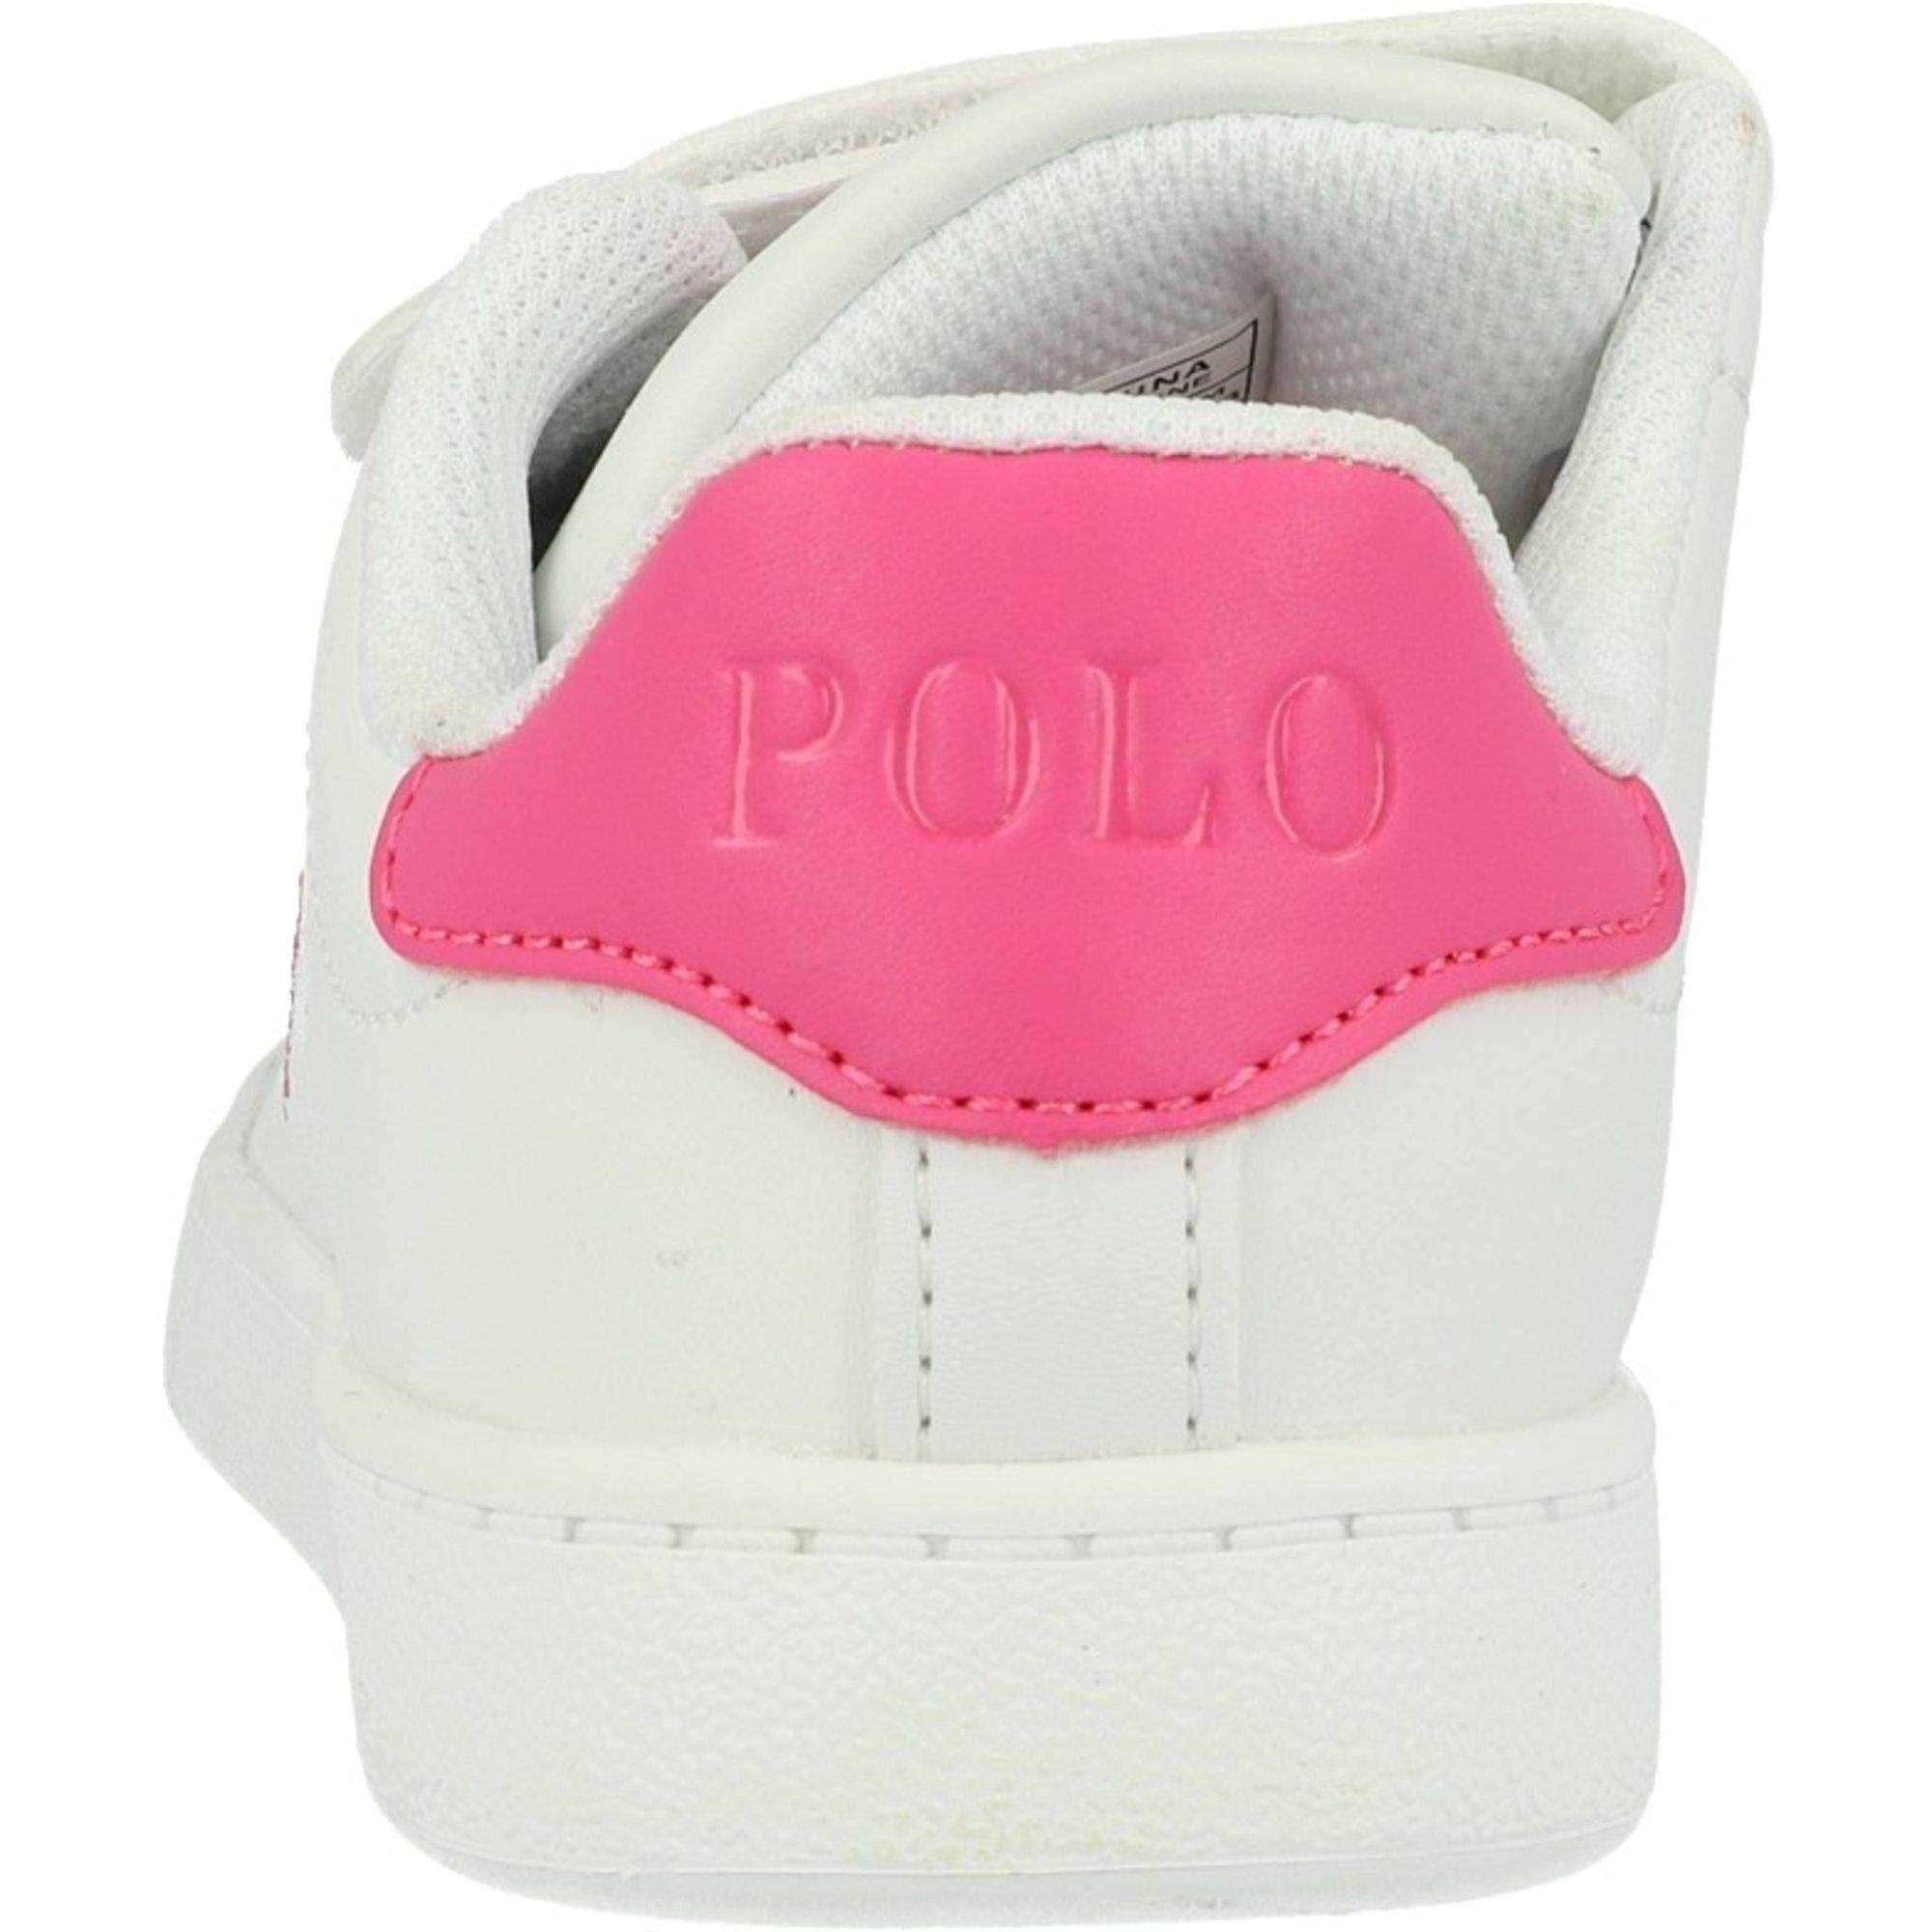 Polo Ralph Lauren Quilton EZ White/Baja Pink Leather